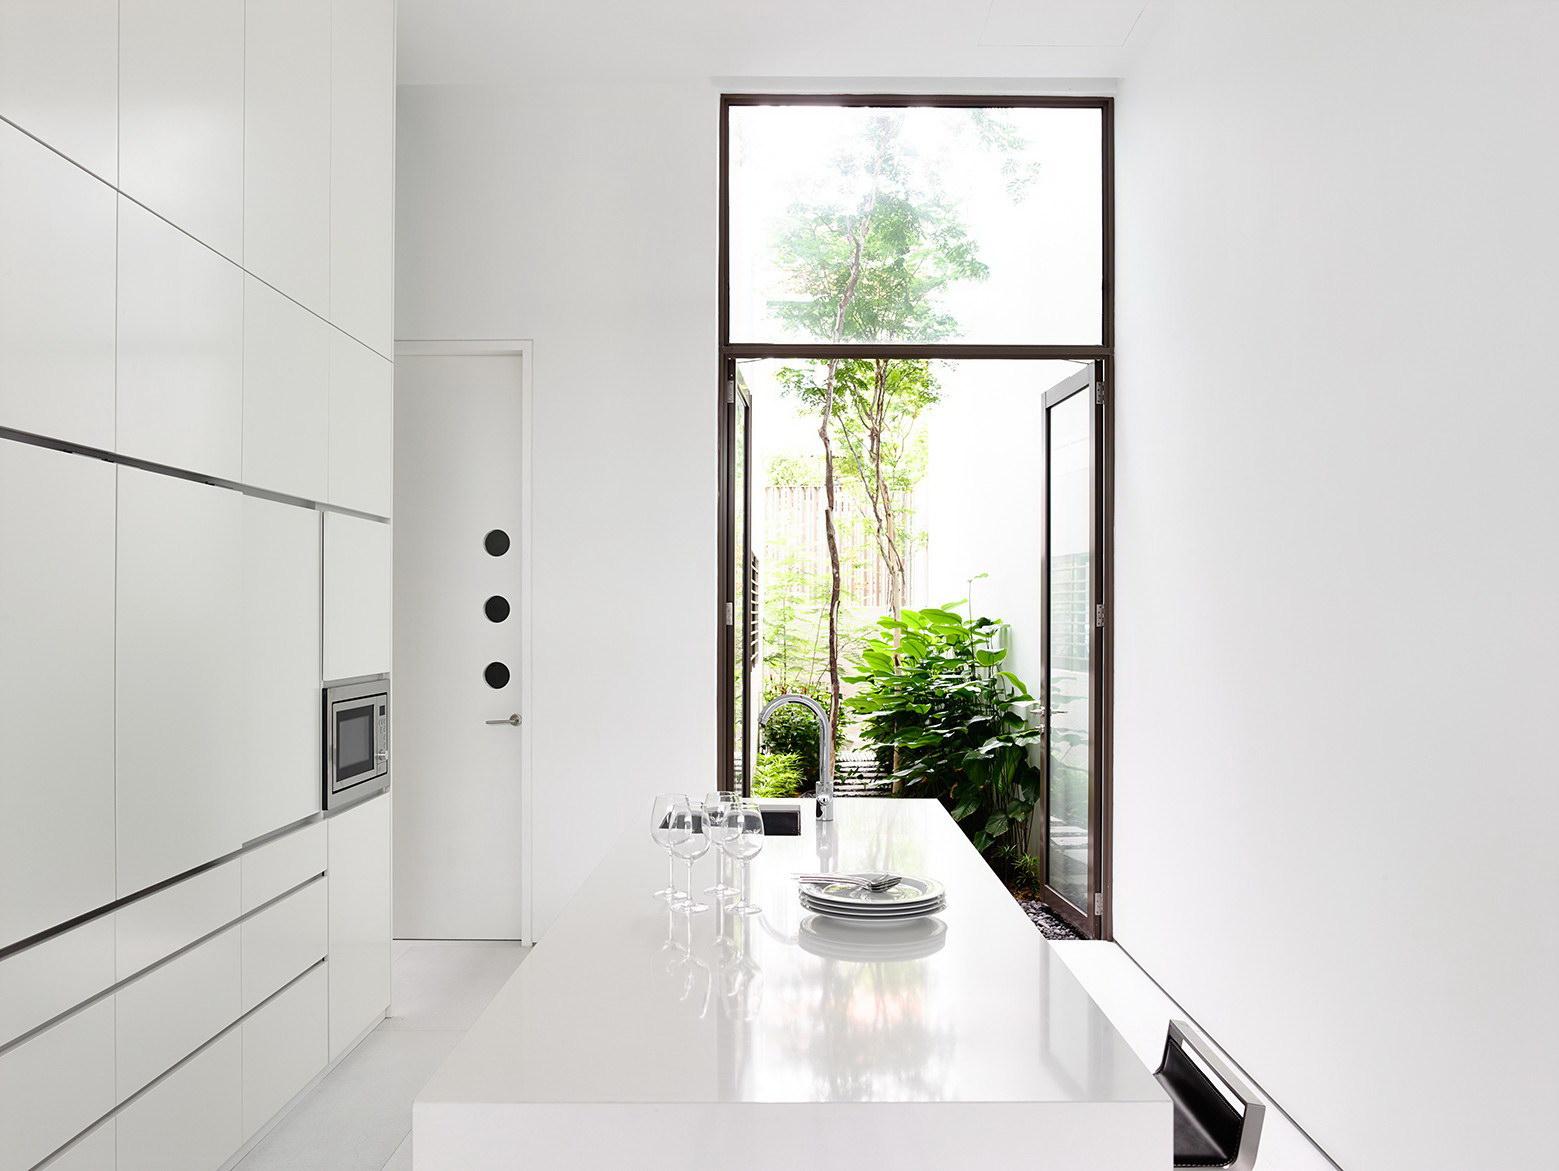 To Catch A Breeze by HYLA Architects